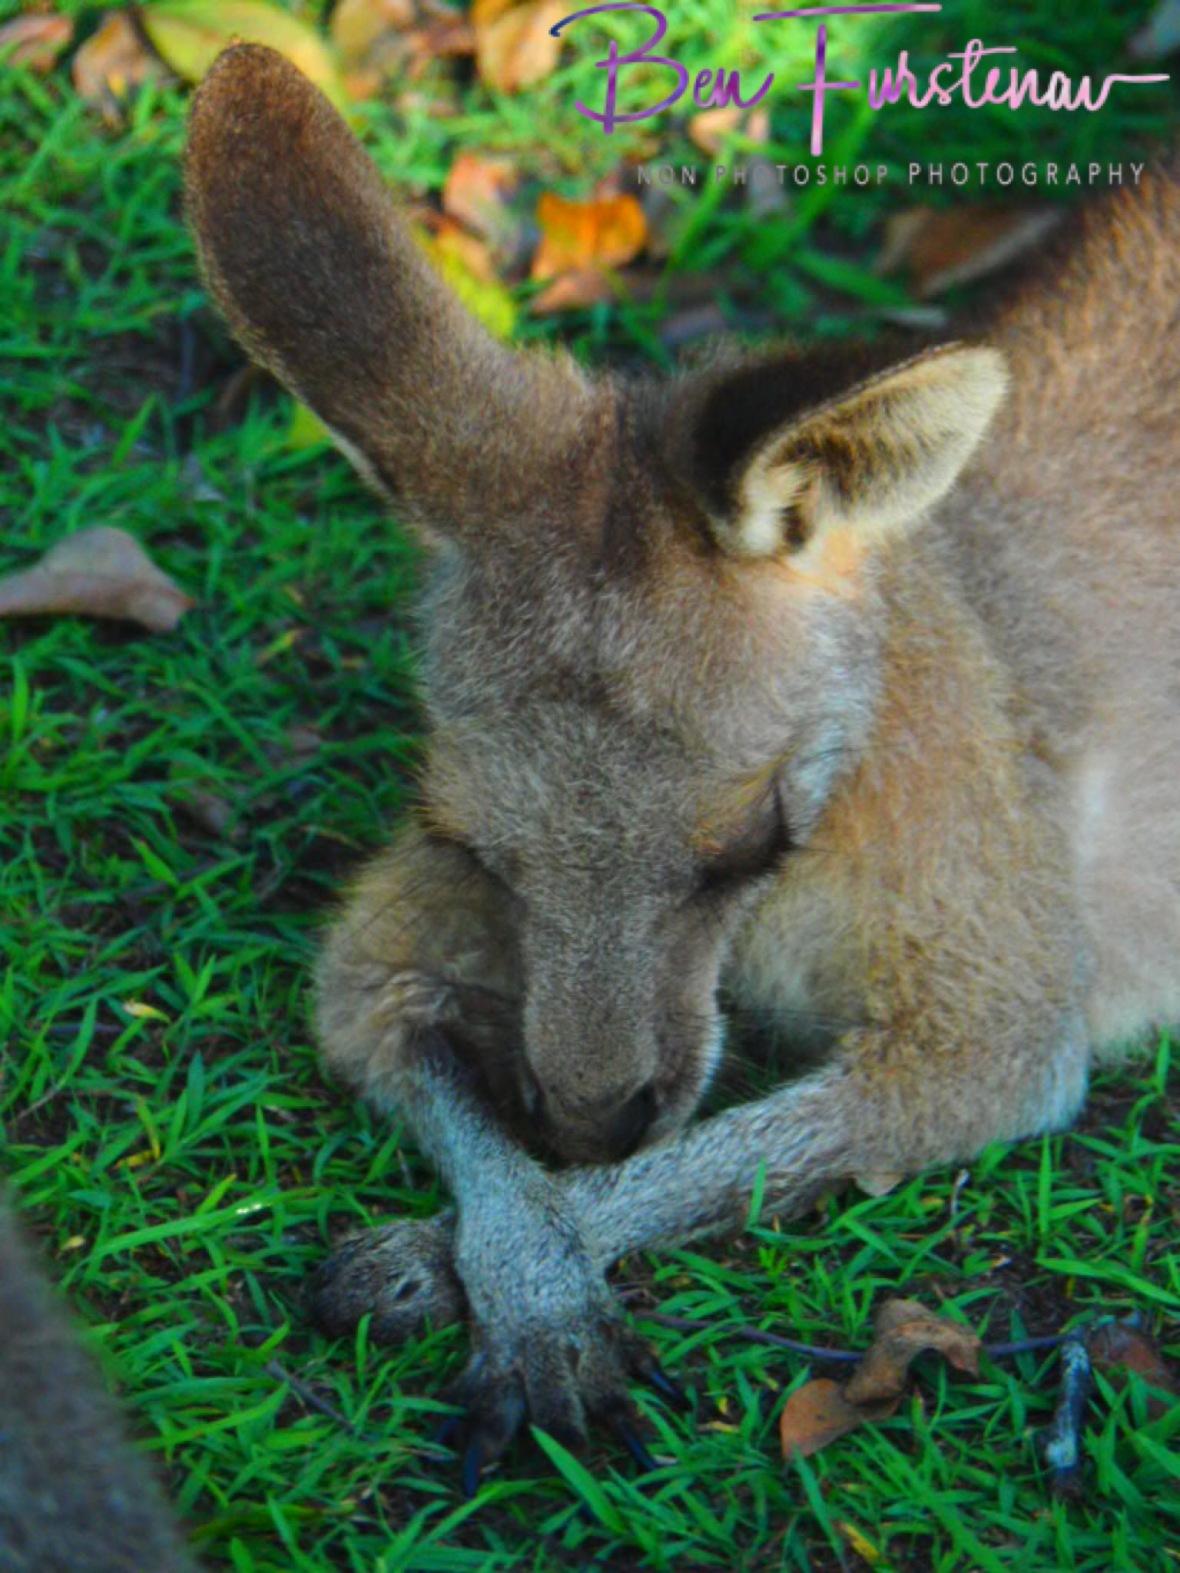 Plum-tugged @ Woody Head, Northern New South Wales, Australia